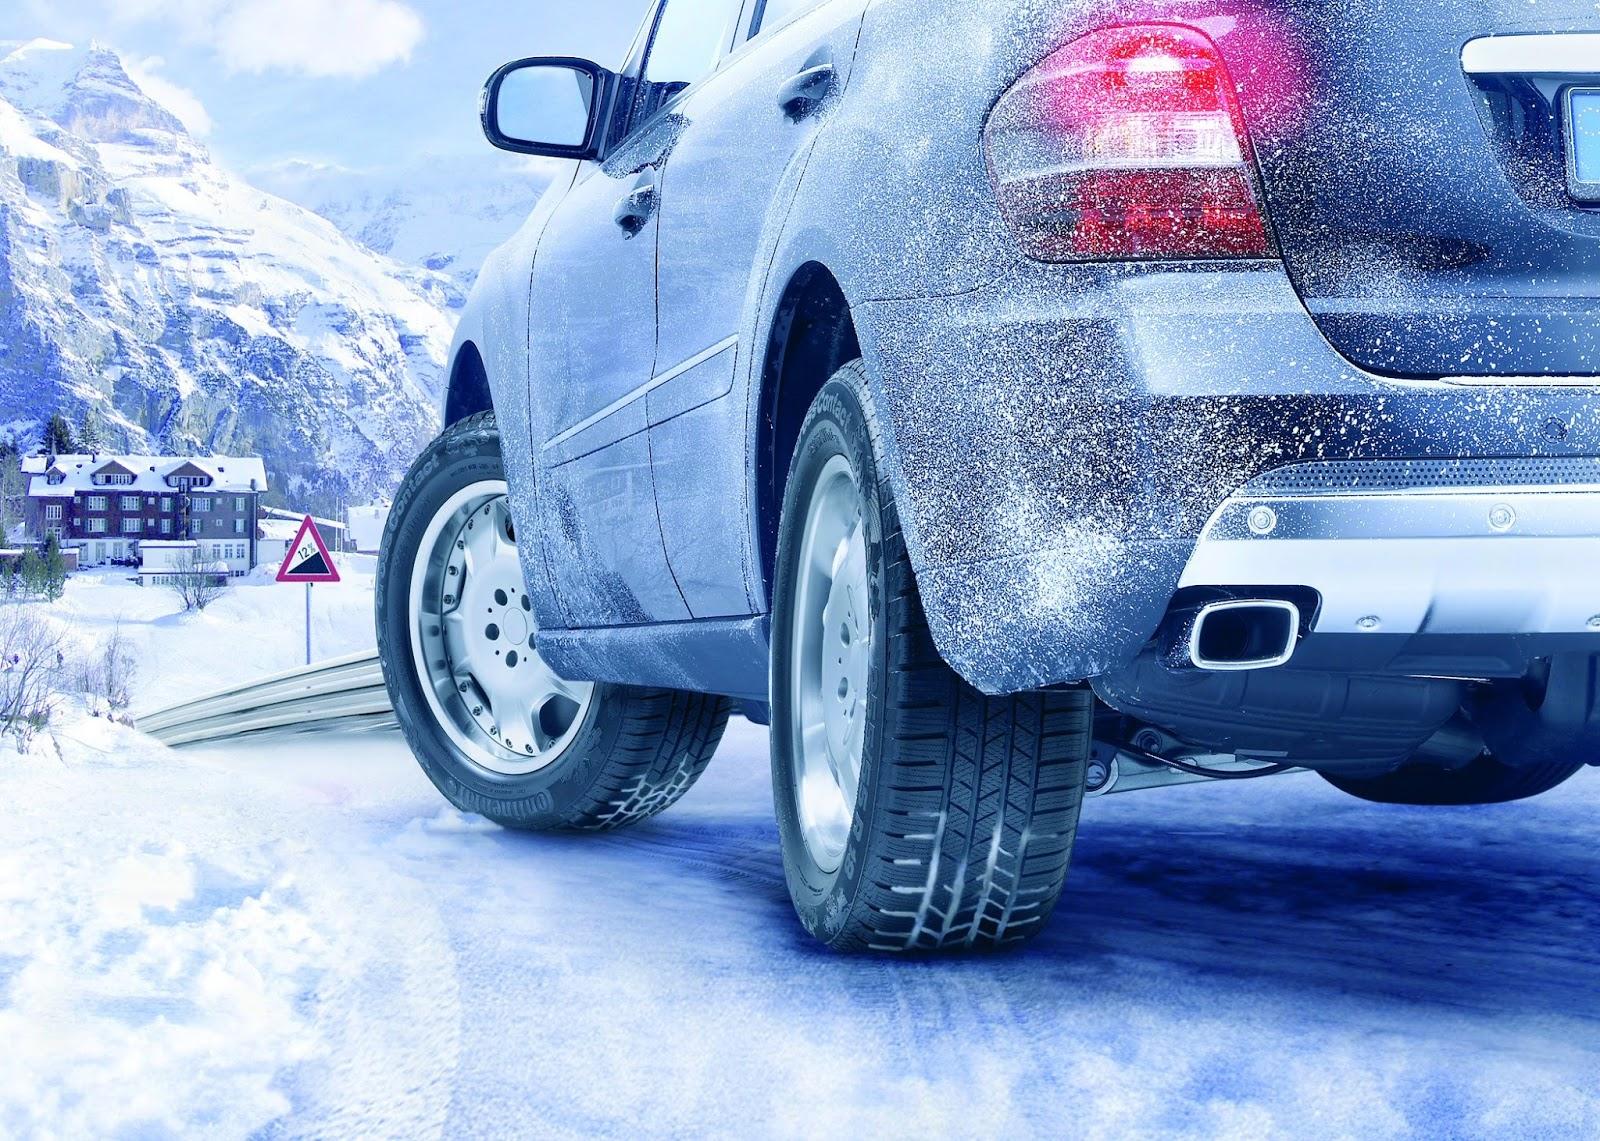 blog post 5 2 581167505 Πώς να προετοιμάσεις το αυτοκίνητό σου για τον χειμώνα